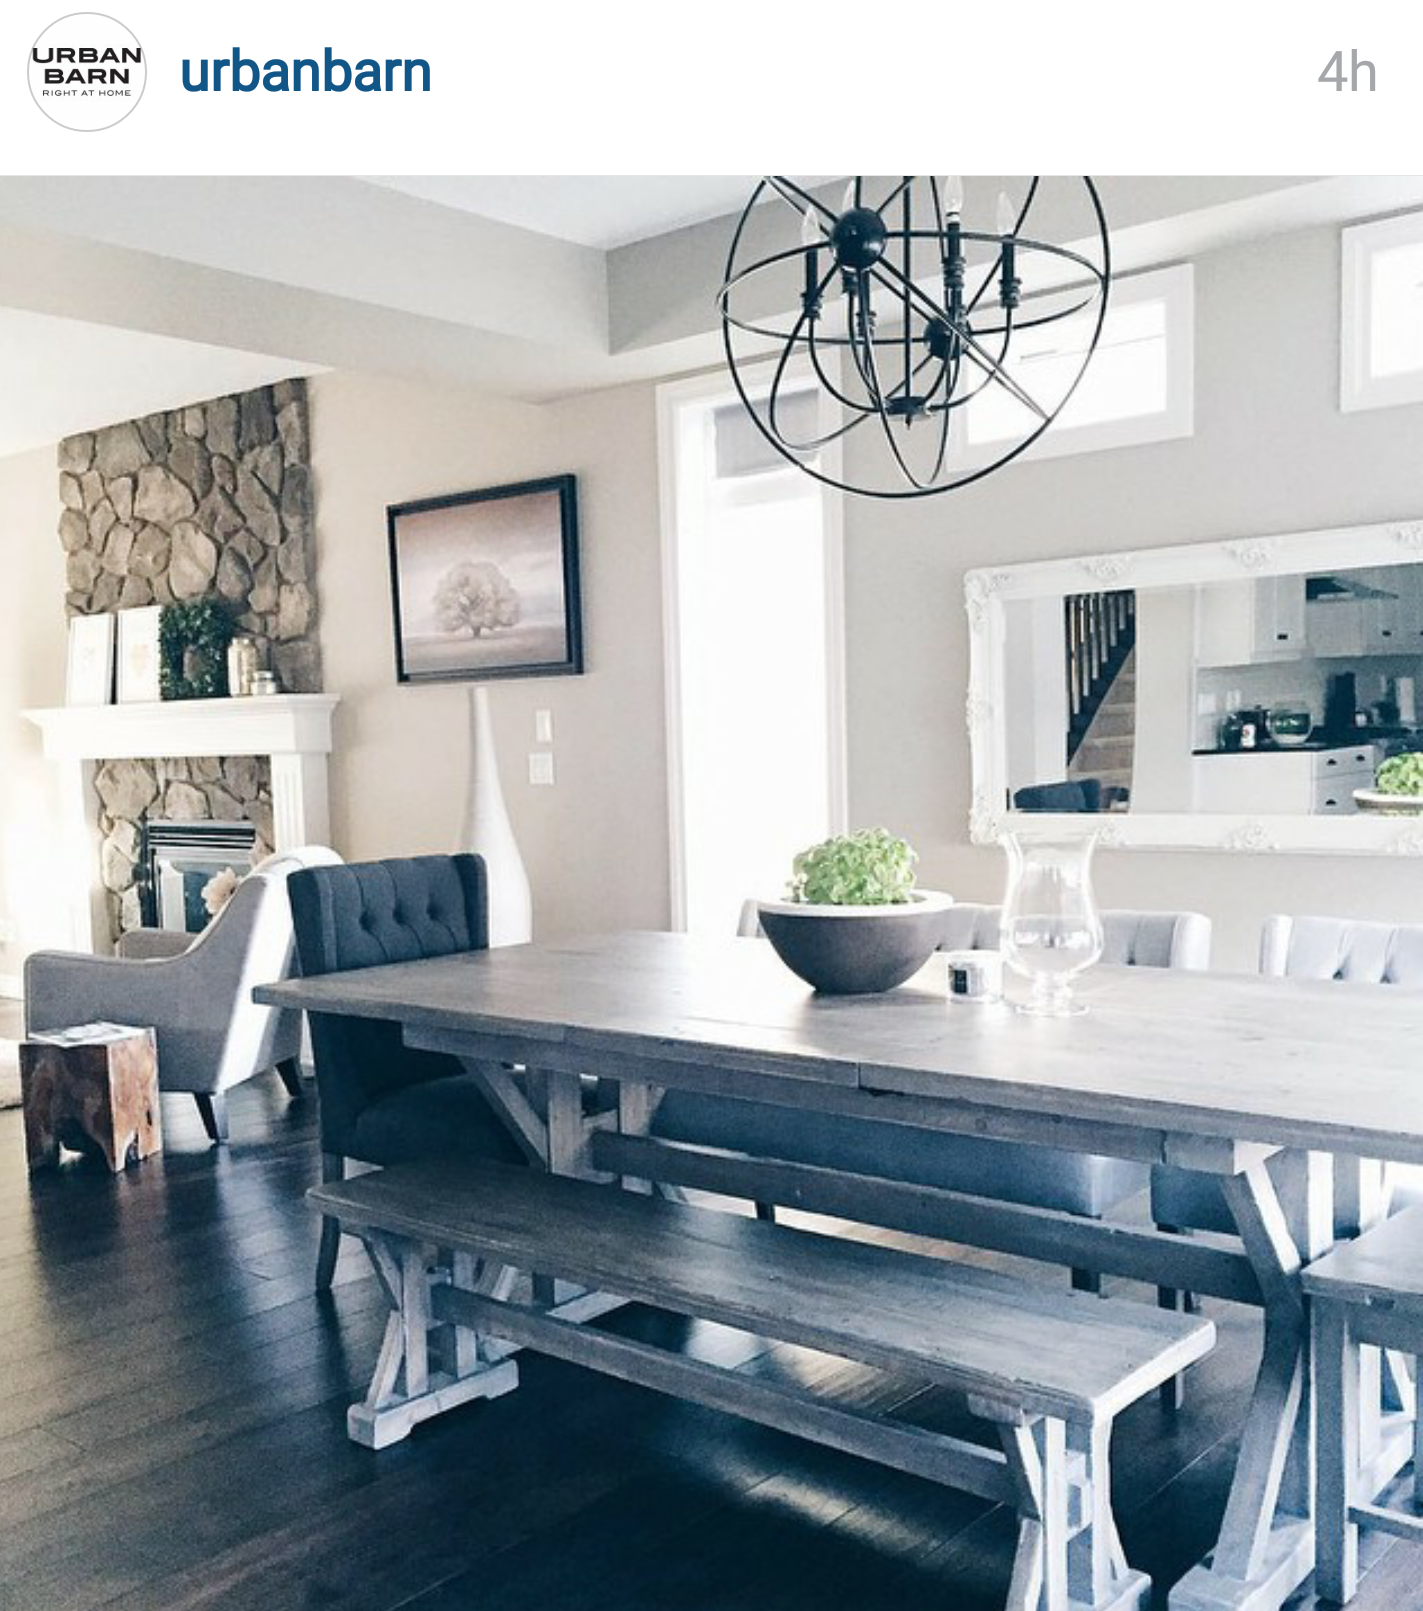 #MyUrbanBarn Winner - July (With images) | Home decor ...